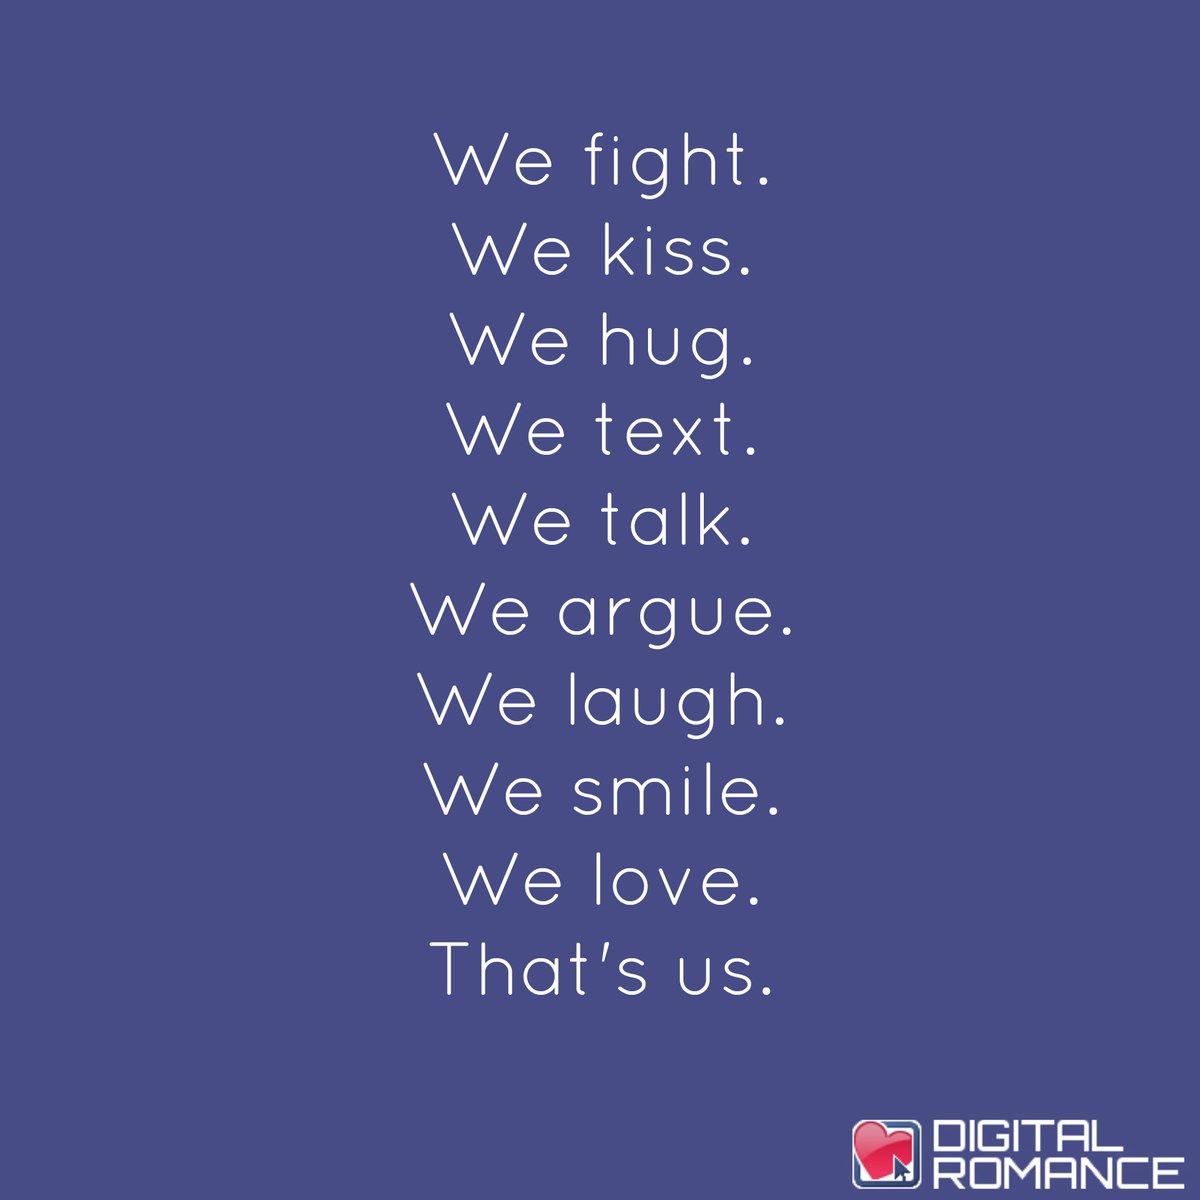 Digital Romance Inc On Twitter We Fight We Kiss We Hug We Text